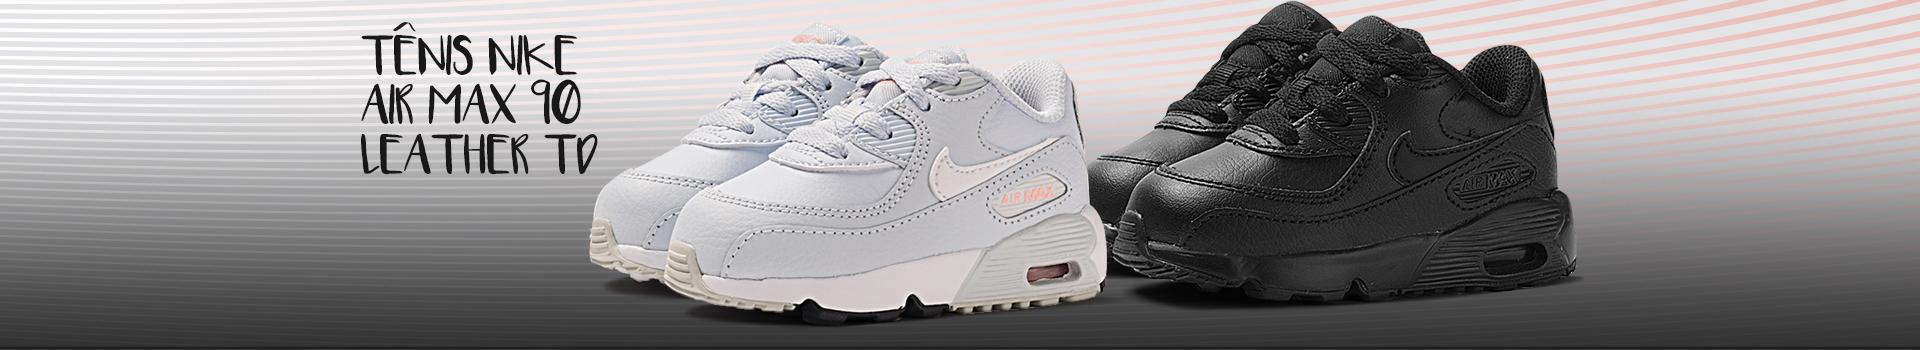 Nike_AM_Leather_90